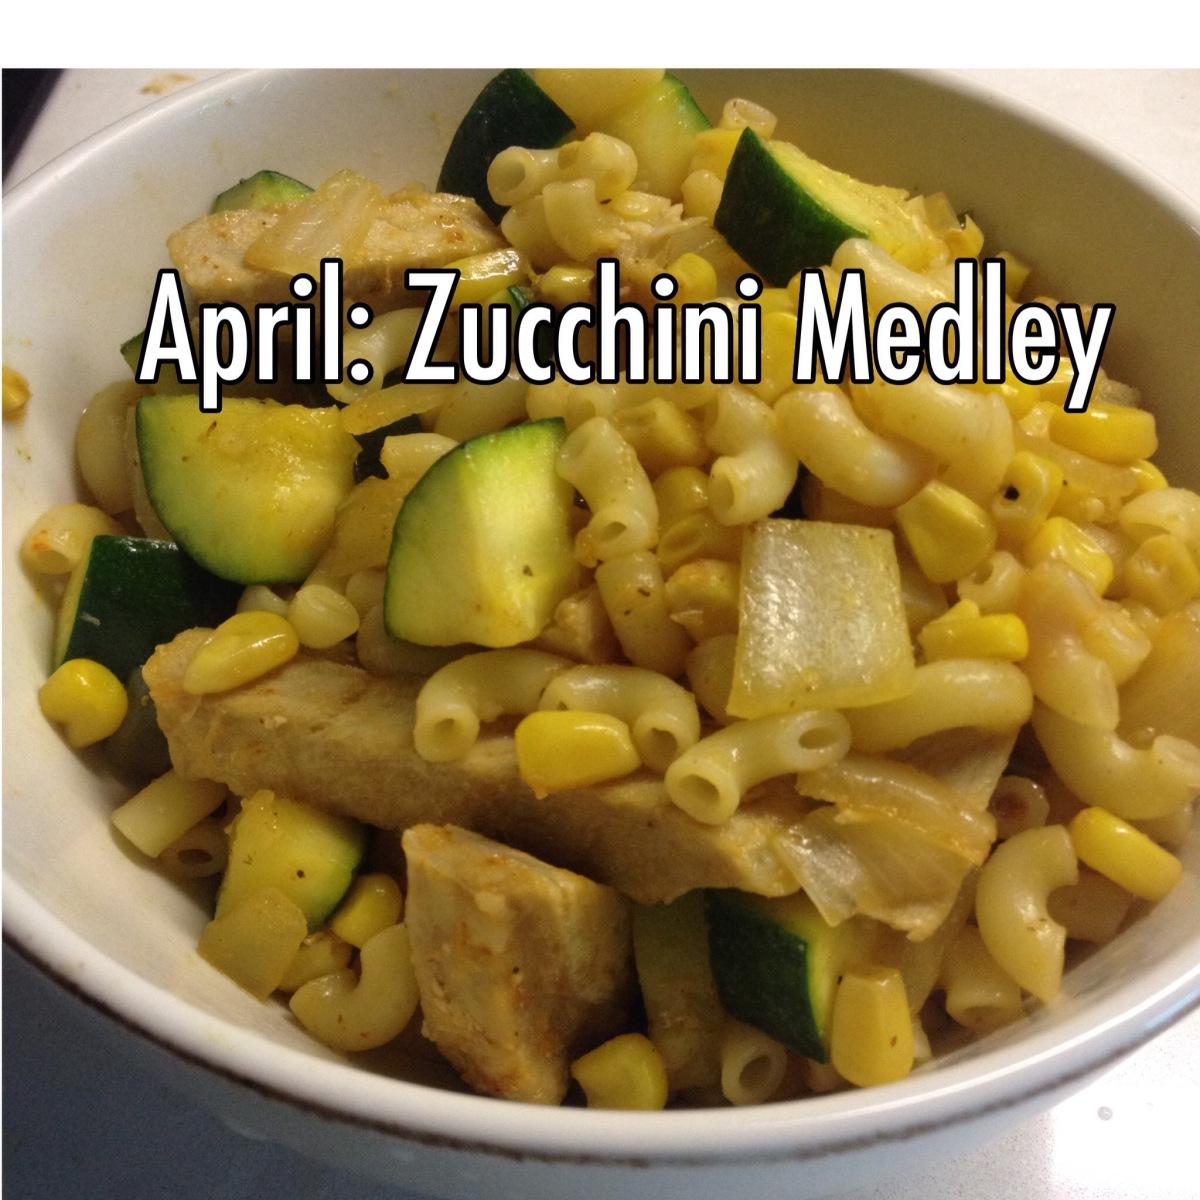 April: Zucchini Medley